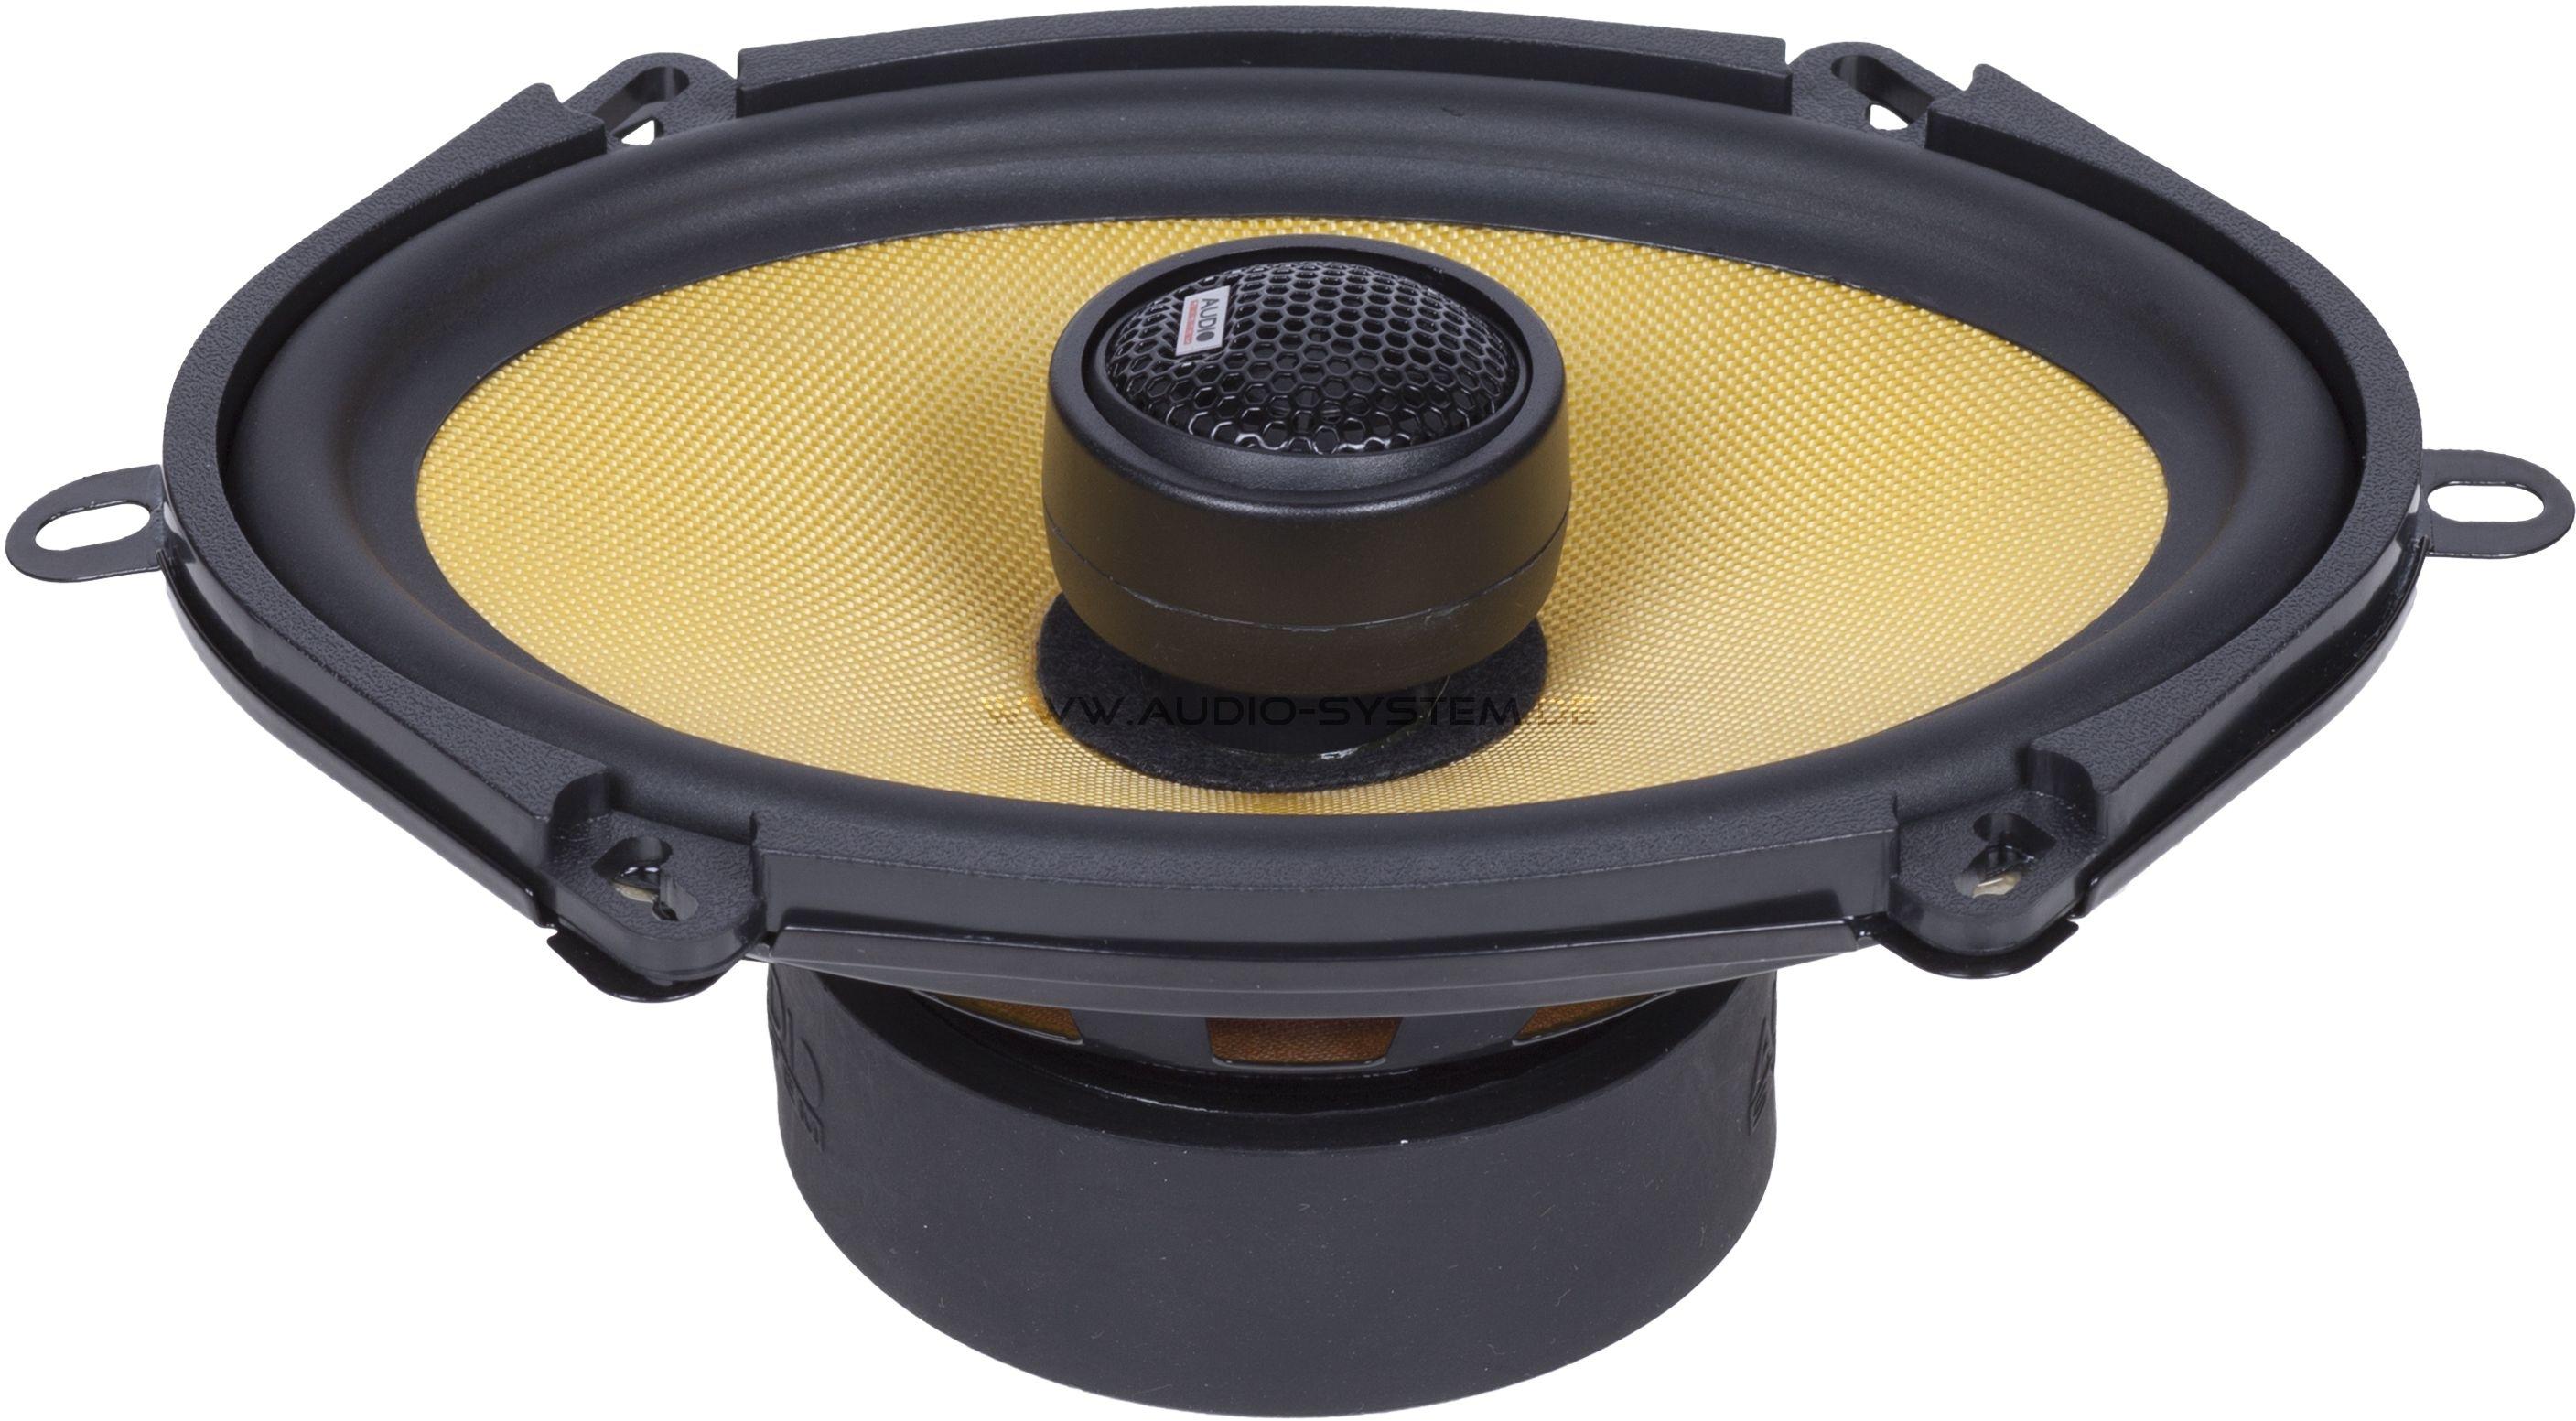 audio system co 507 plus audiosystem lautsprecher. Black Bedroom Furniture Sets. Home Design Ideas